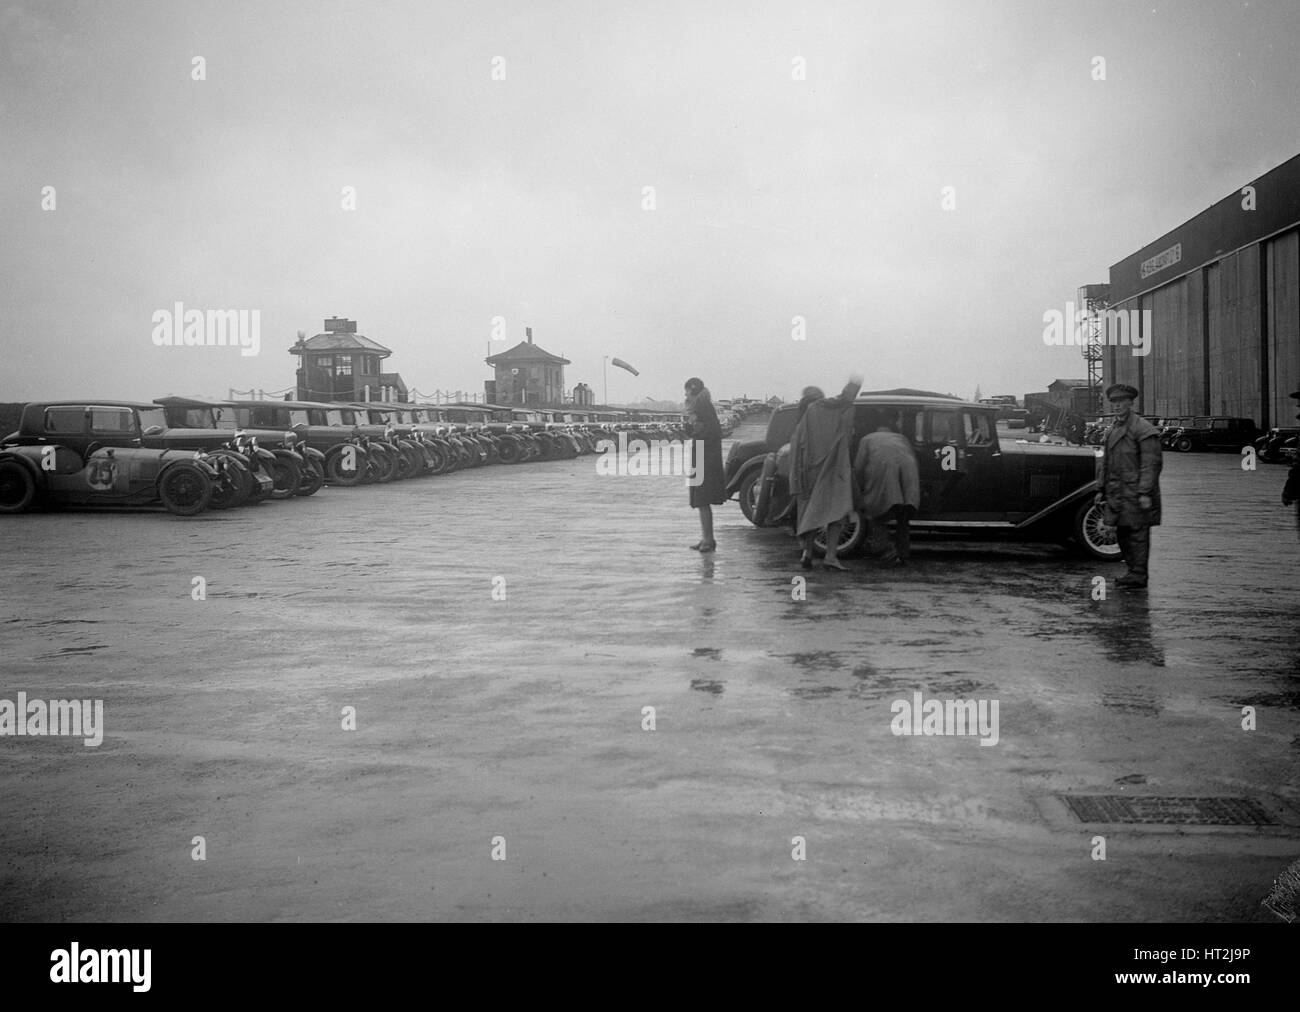 Cars at the Riley Motor Club Rally, Croydon Aerodrome, 25 April 1931. Artist: Bill Brunell. - Stock Image